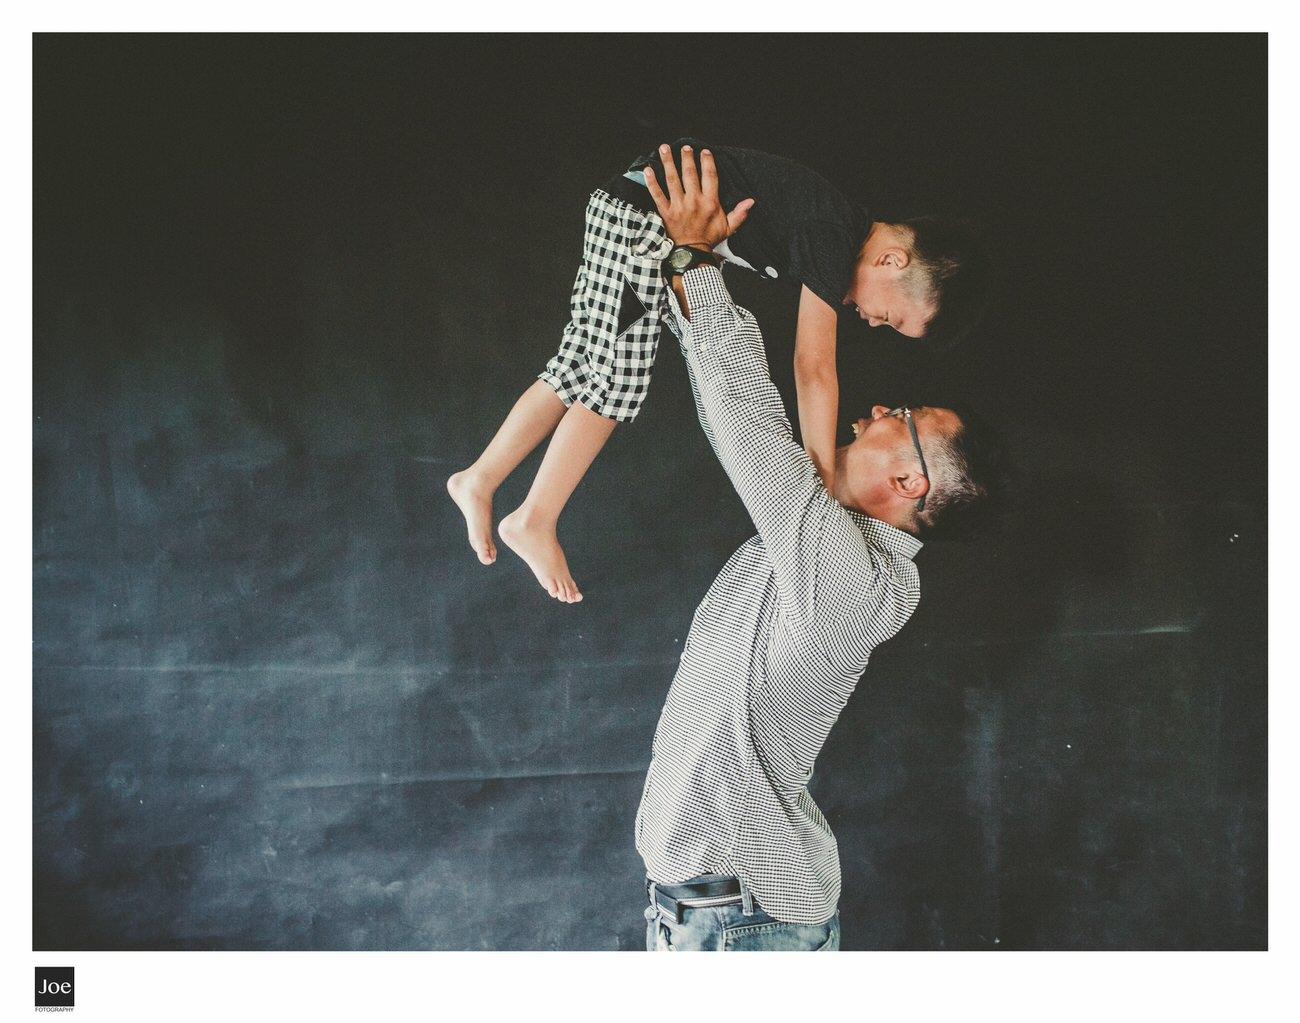 joe-fotography-family-photo-pepper-salt-bowtie-007.jpg